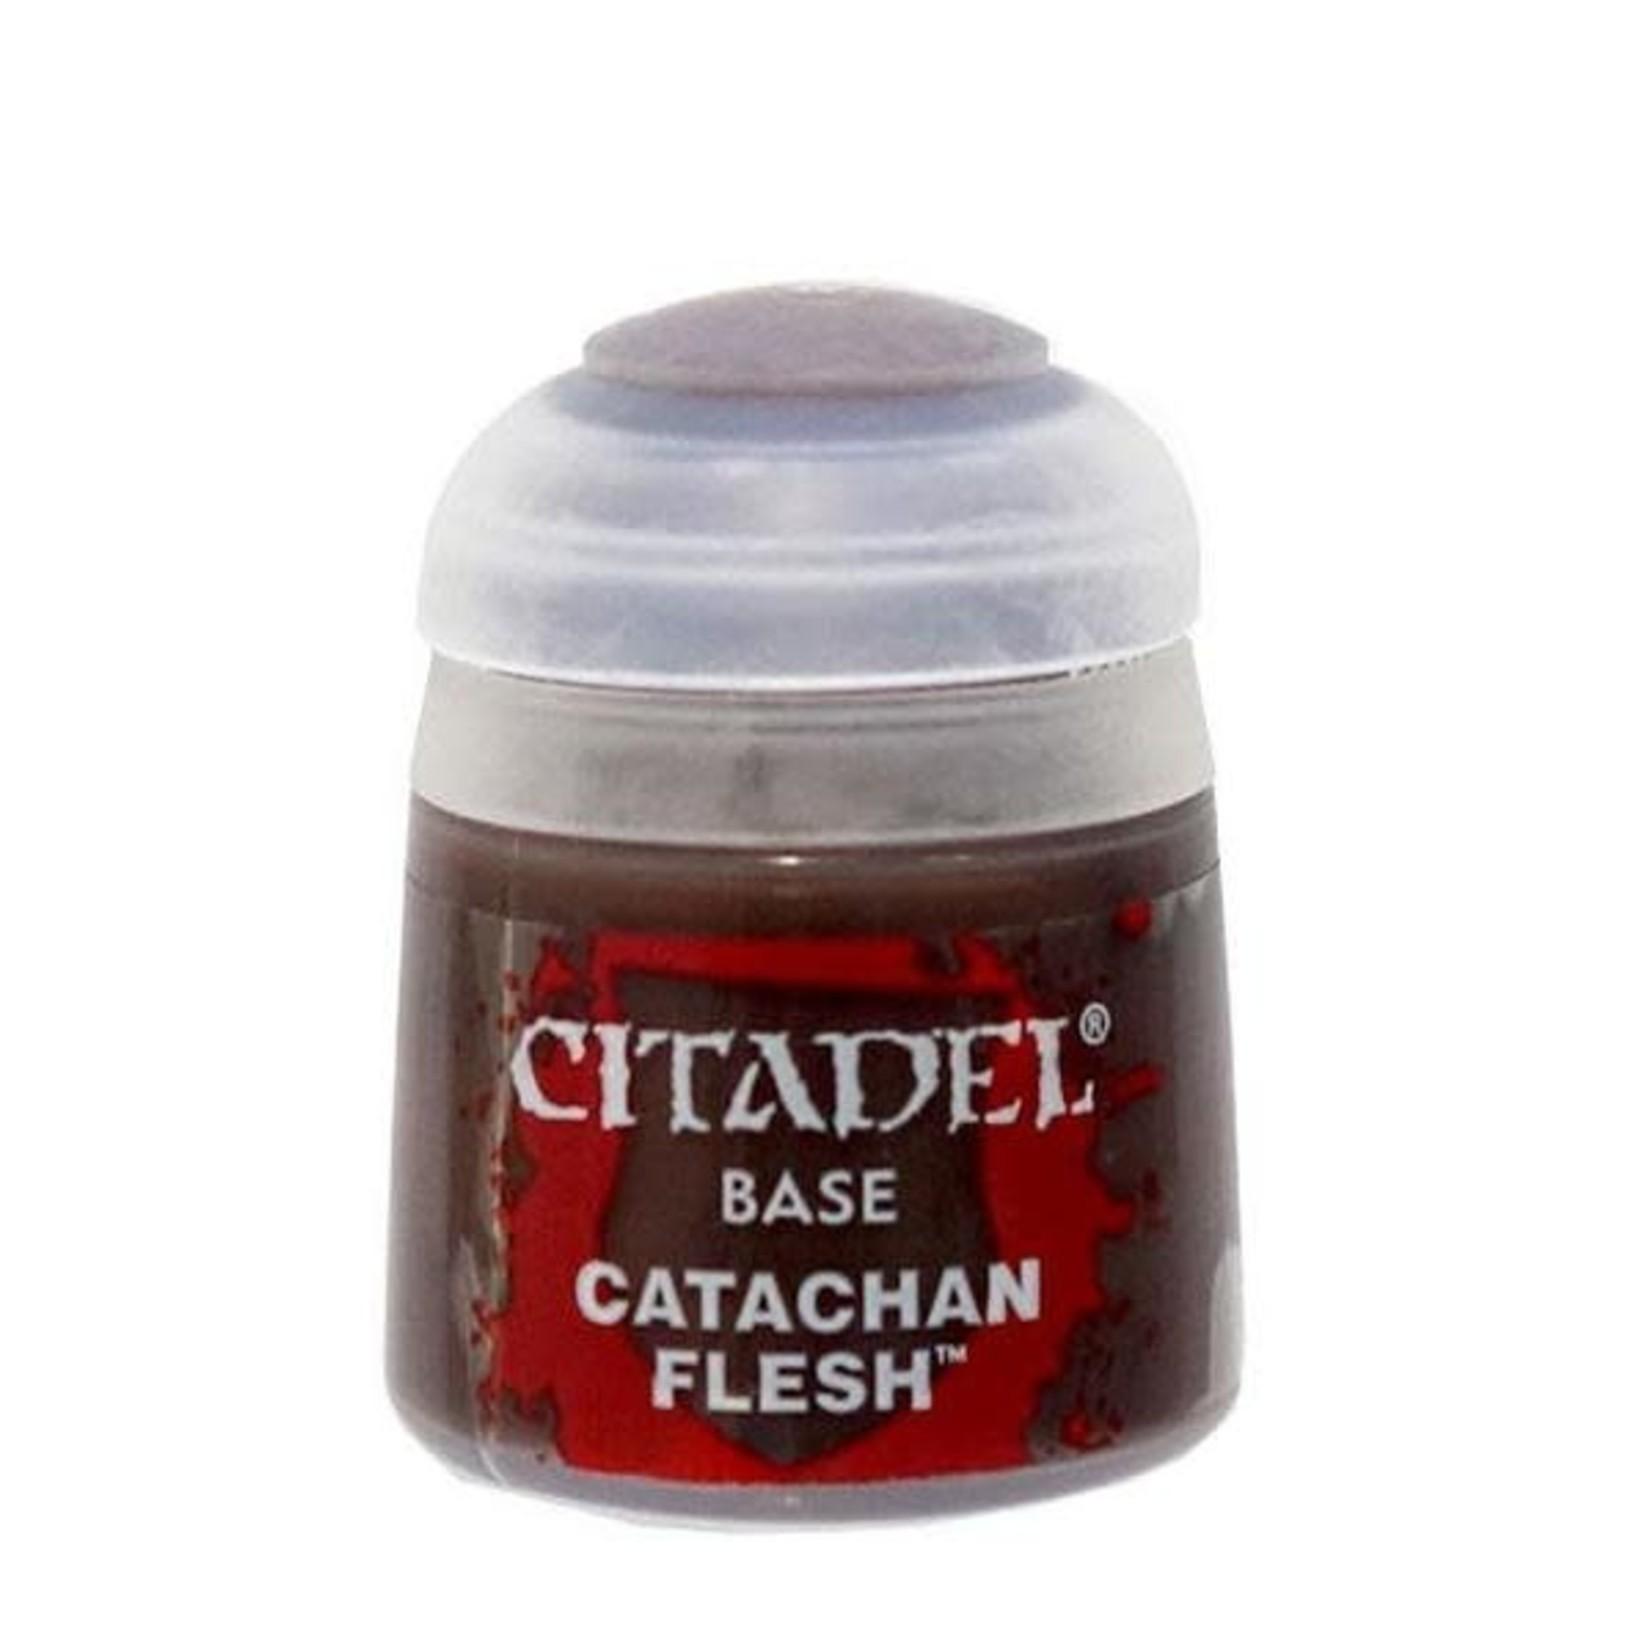 Citadel Citadel Paint - Base: Catachan Fleshtone